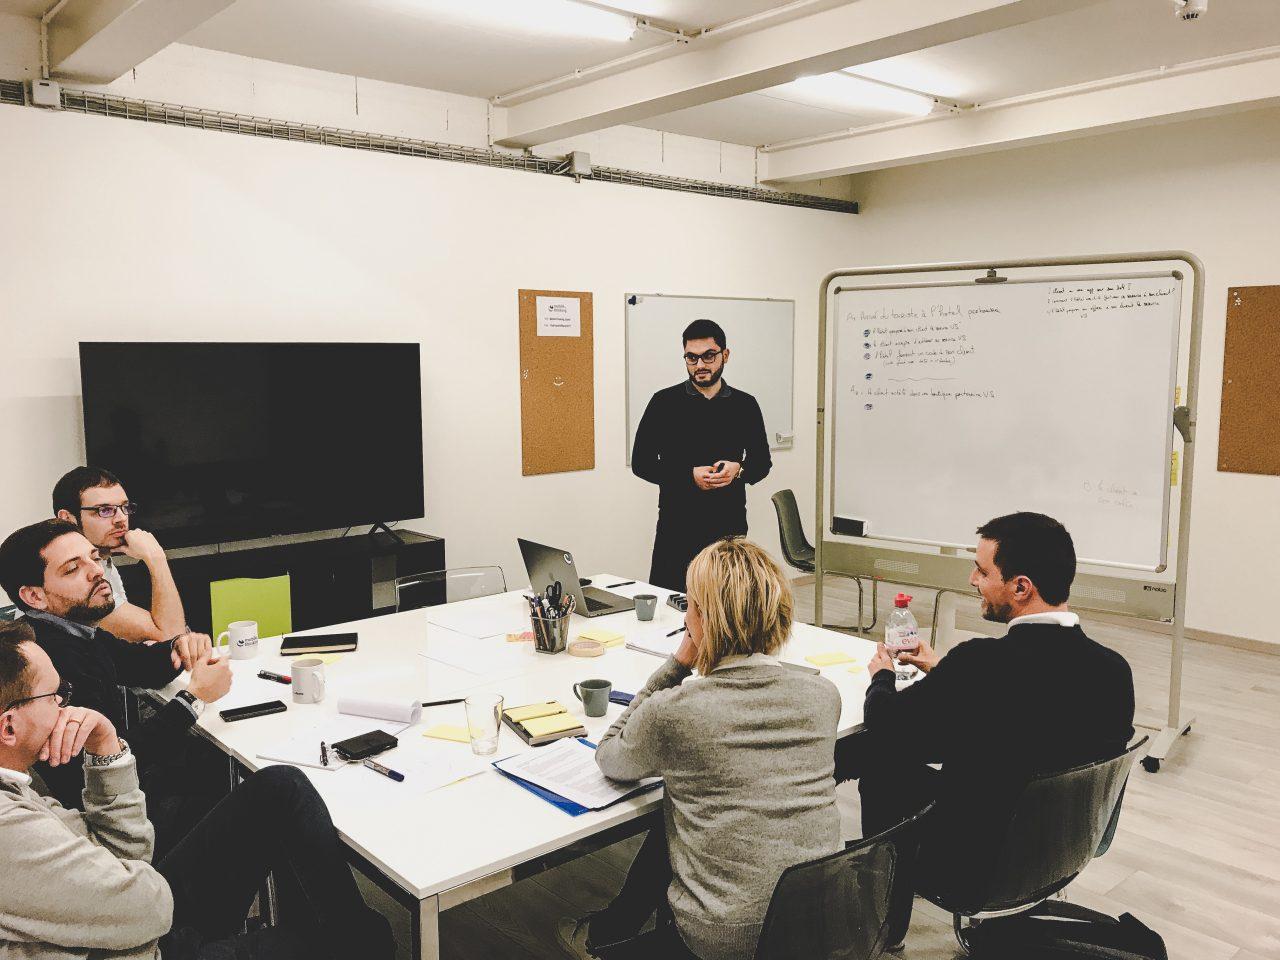 Hassan Helbawi Atelier de conception Genève Design thinking